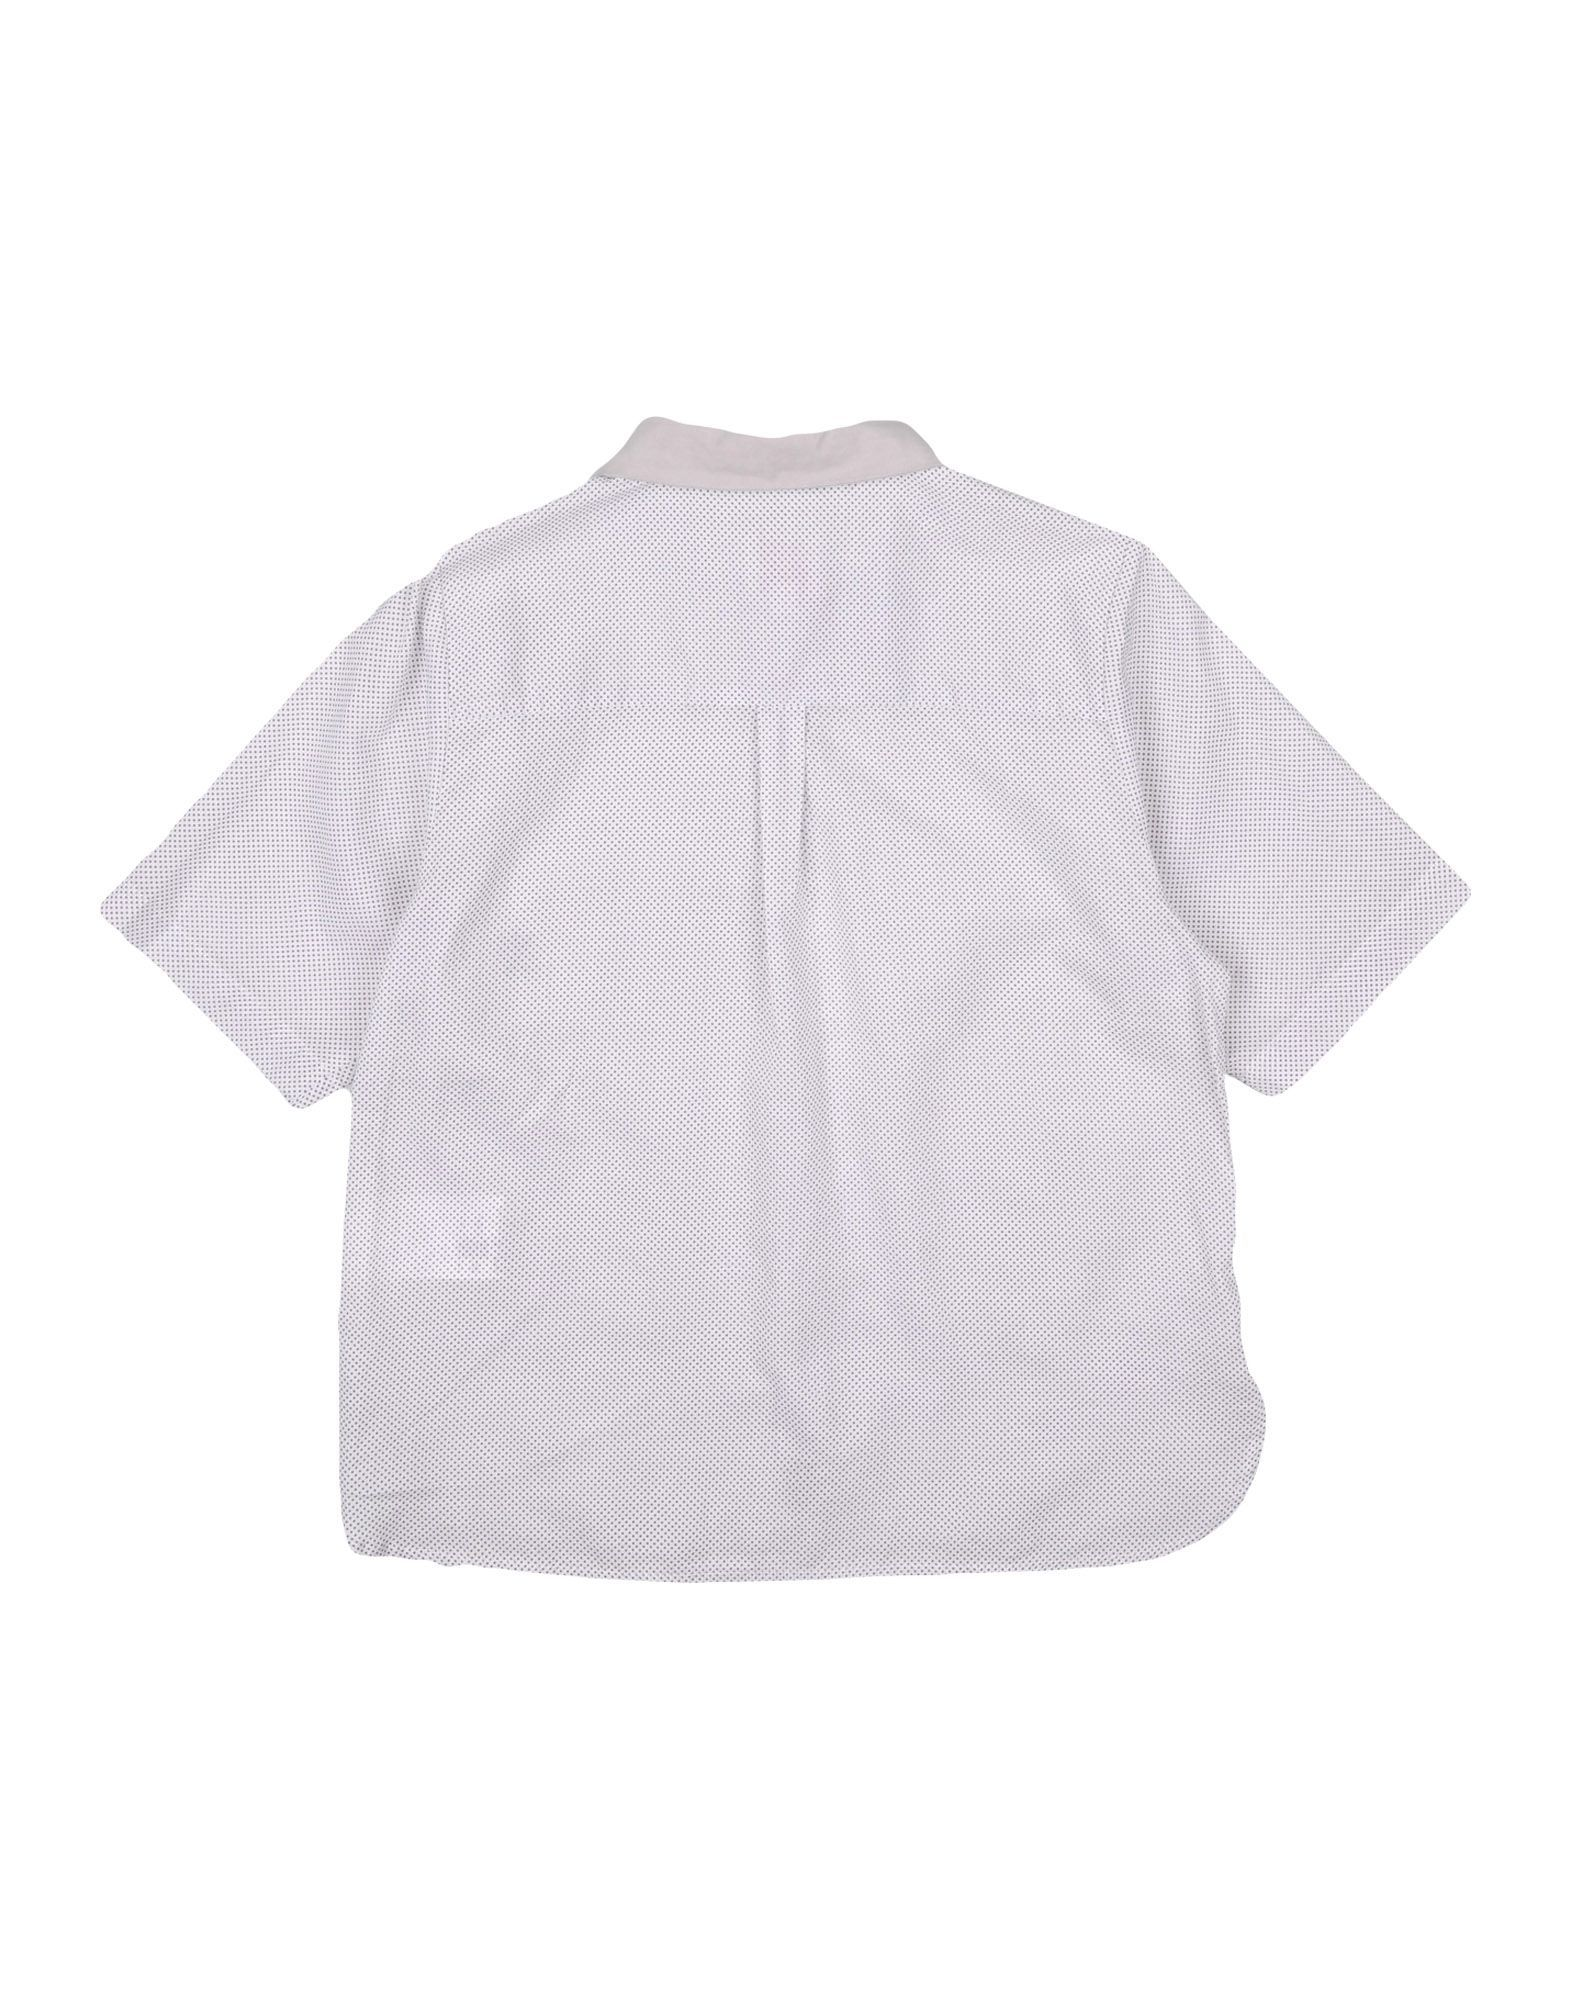 Mauro Grifoni Grey Cotton Shirt